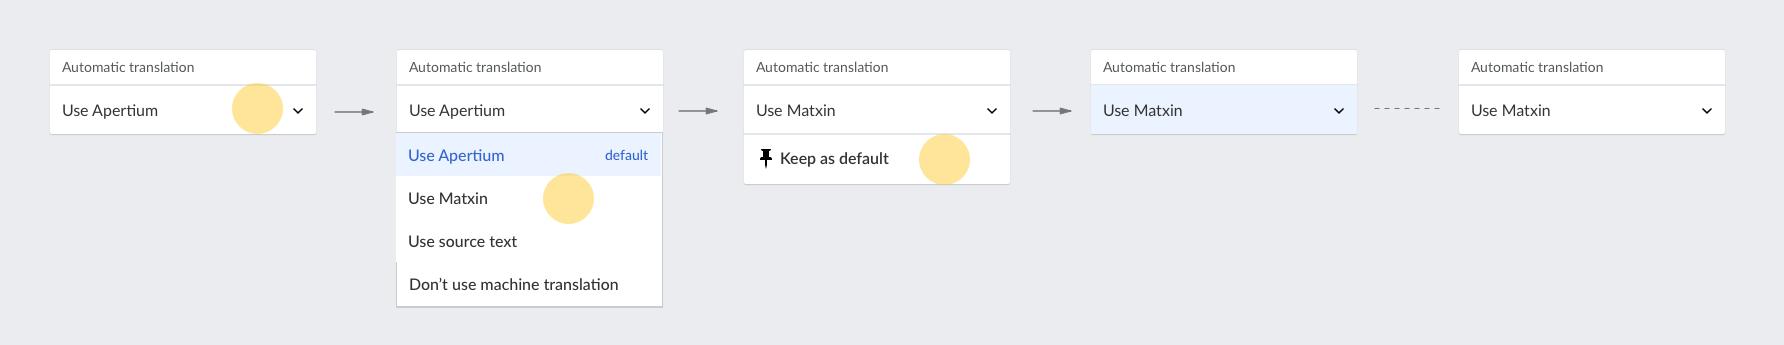 CX-mt-adjust-simplified.png (345×1 px, 36 KB)